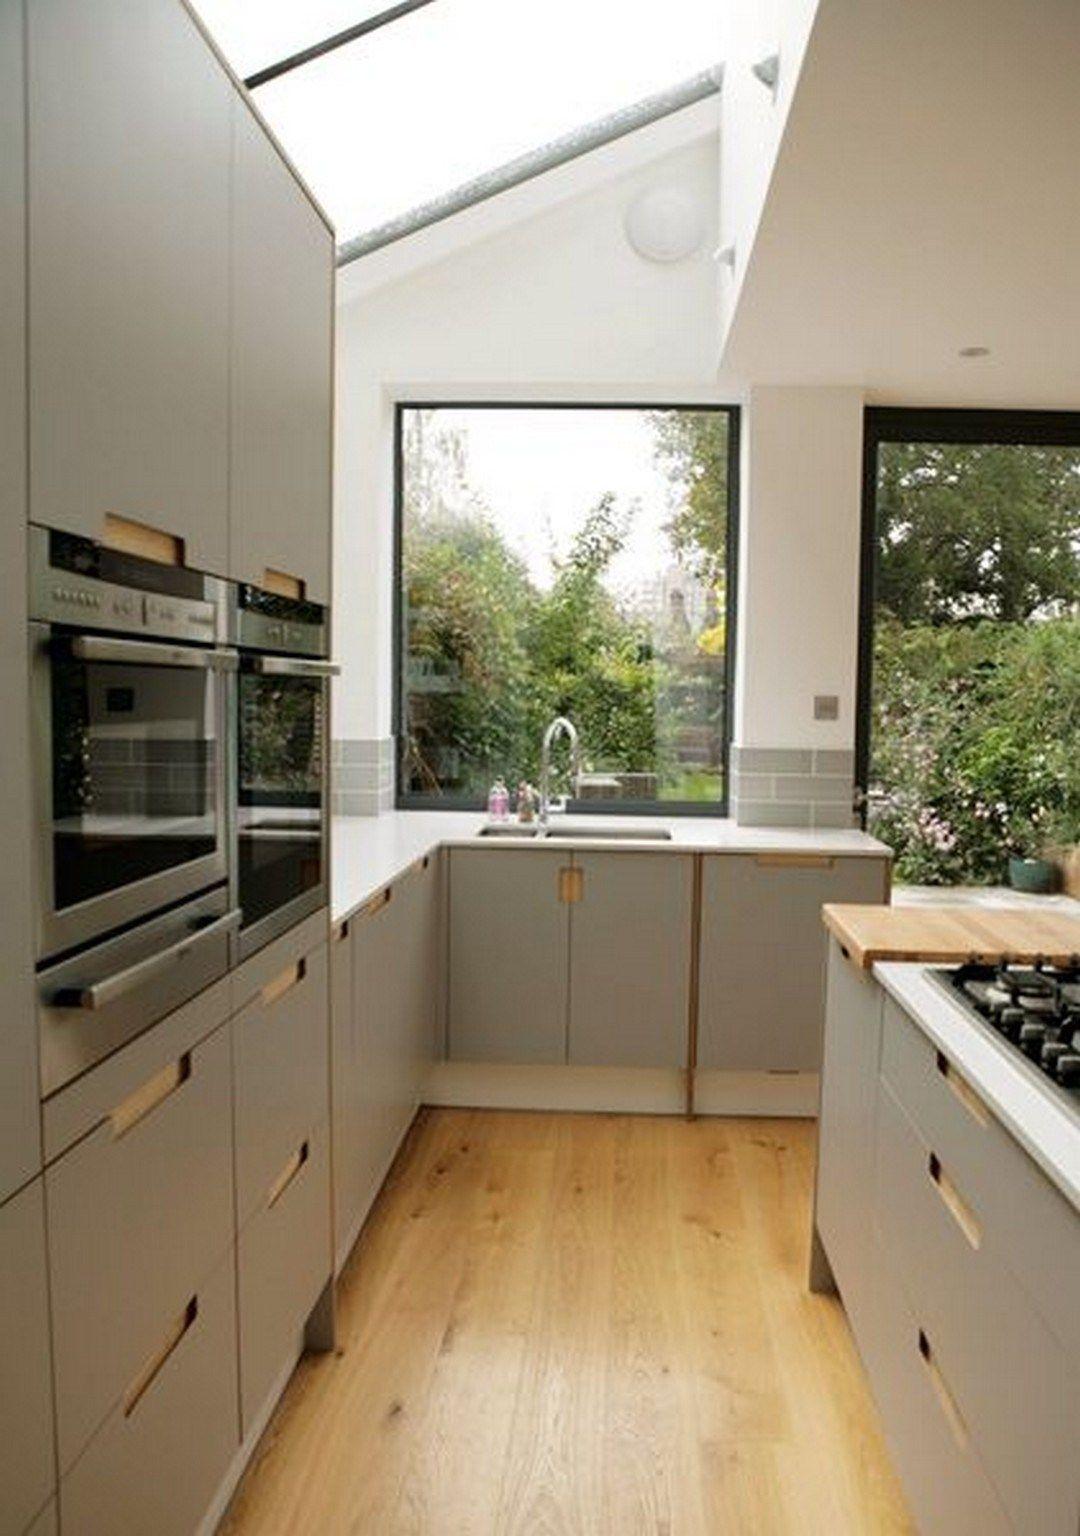 41 Elegant L Shaped Kitchen Design Ideas 15 Plywood Kitchen Kitchen Layout Diy Kitchen Renovation